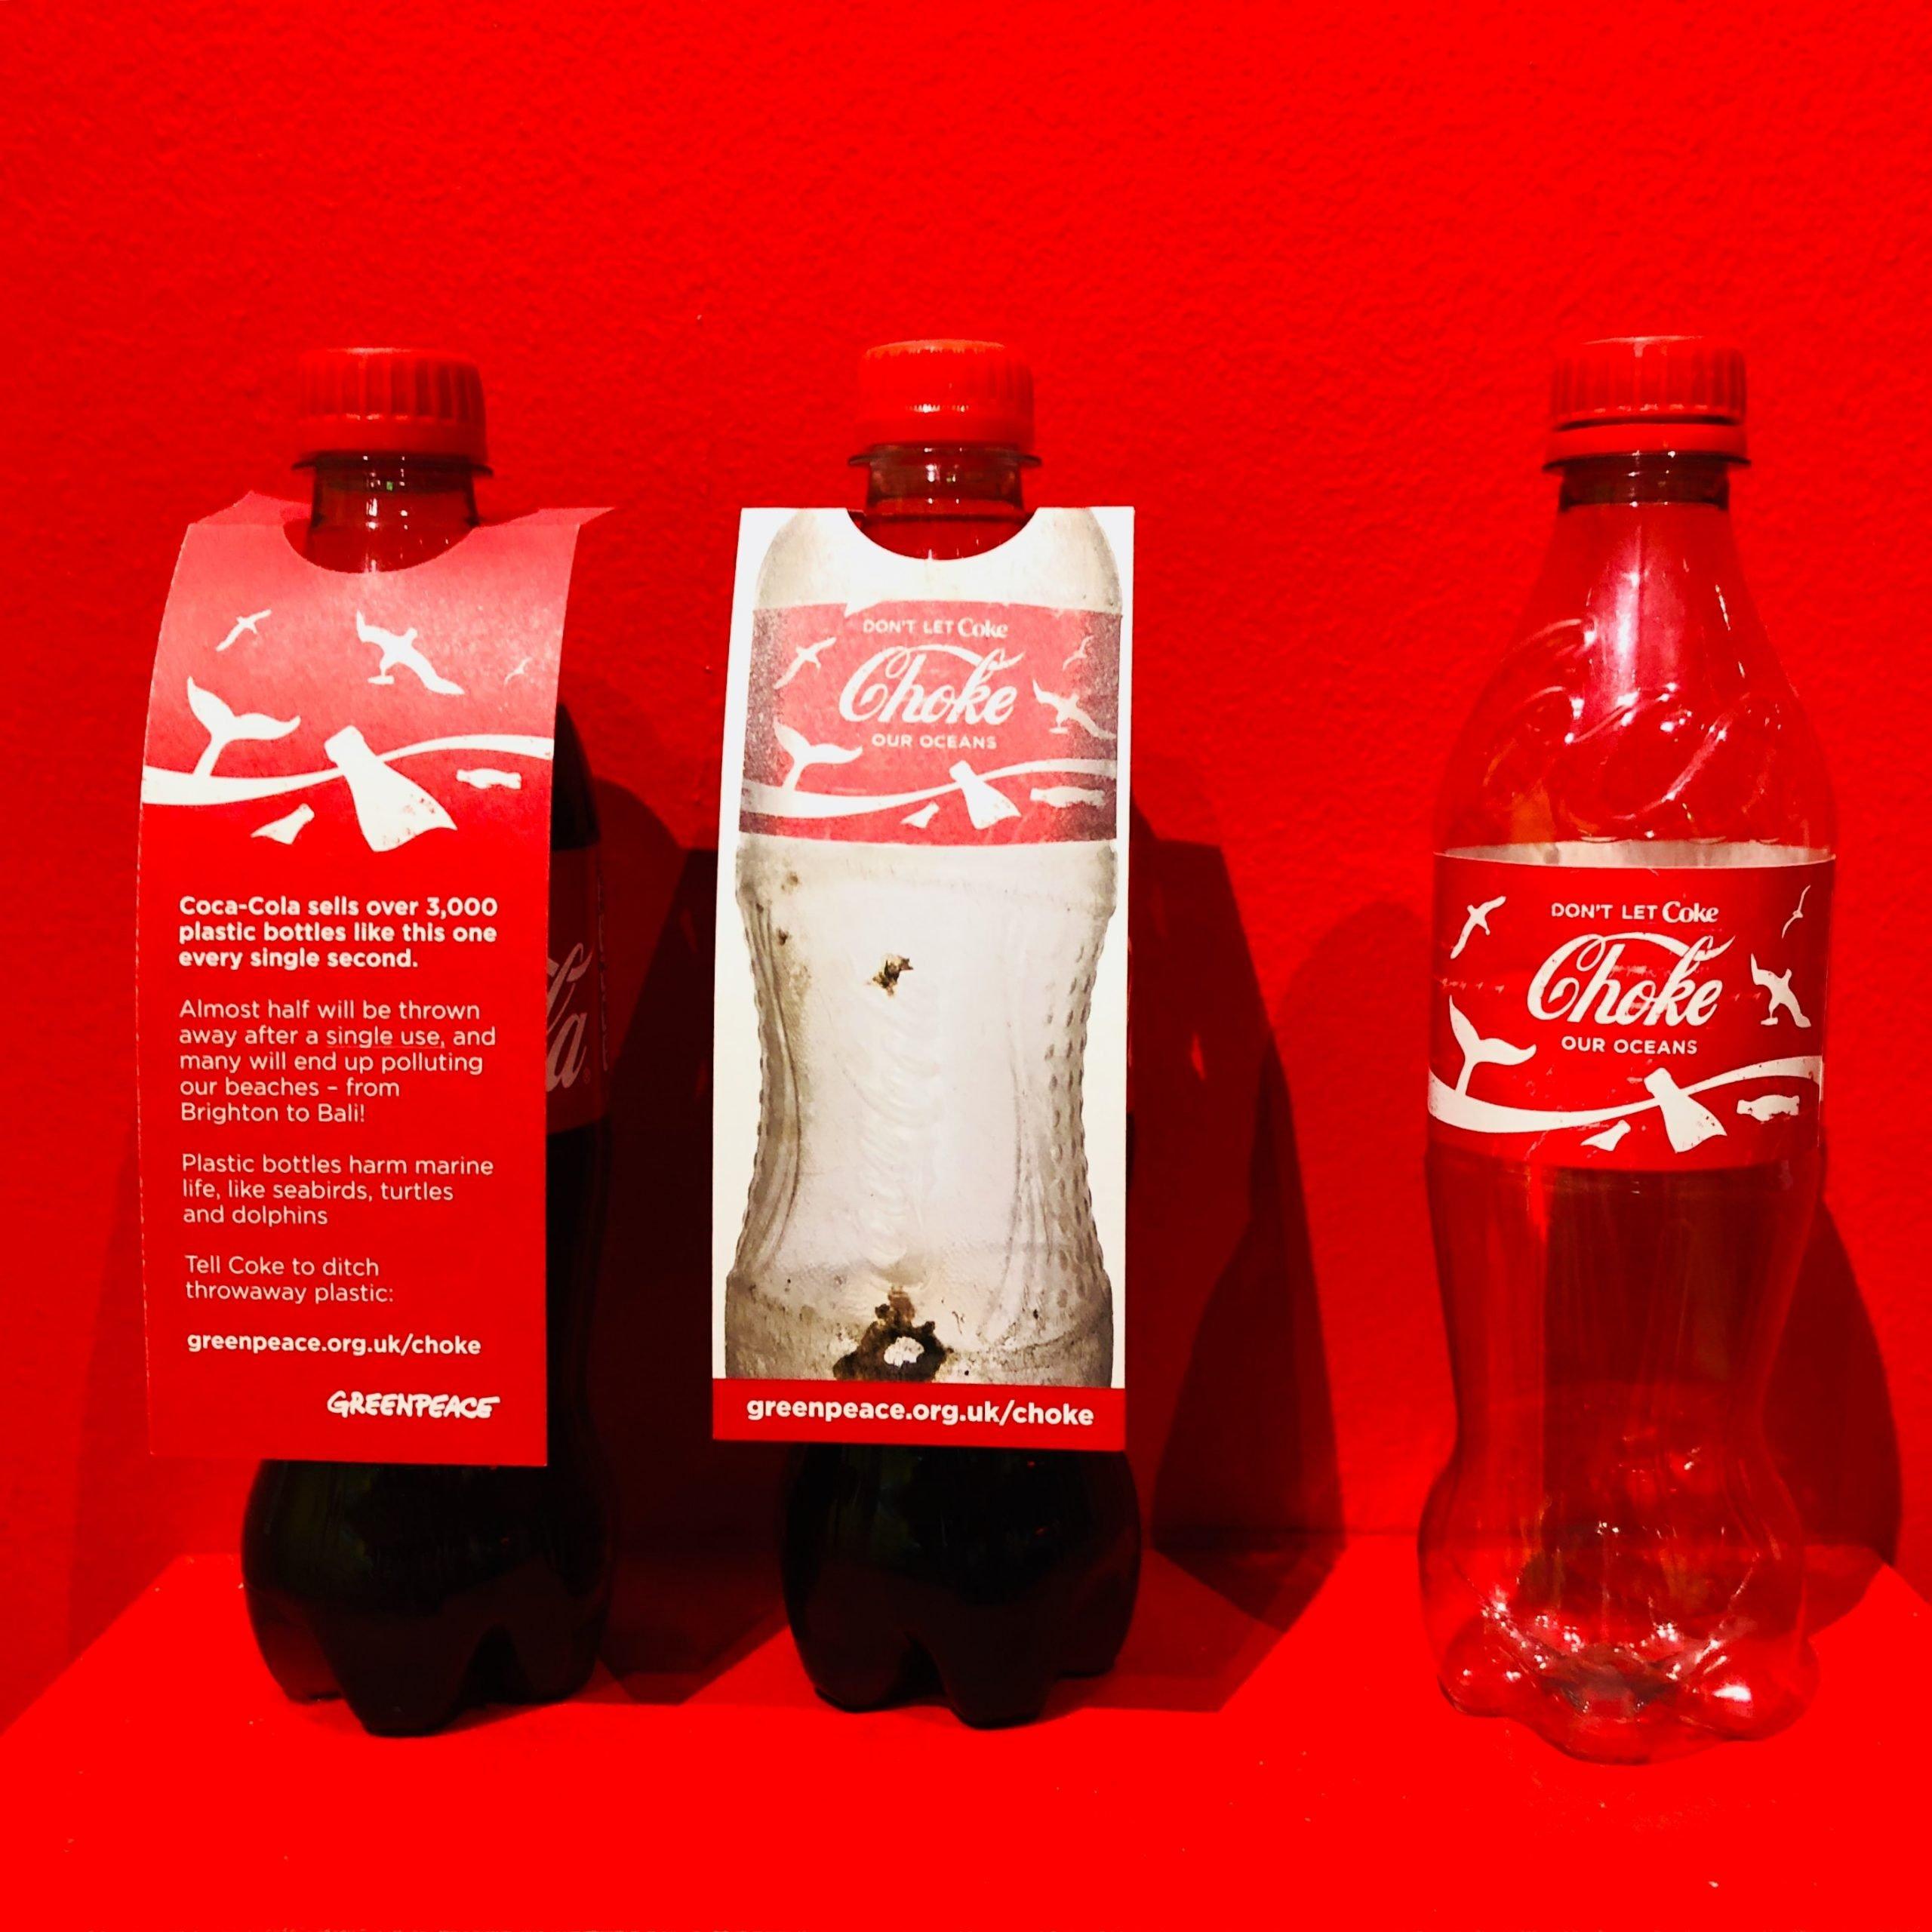 Greenpeace shows how Coke bottles pollute